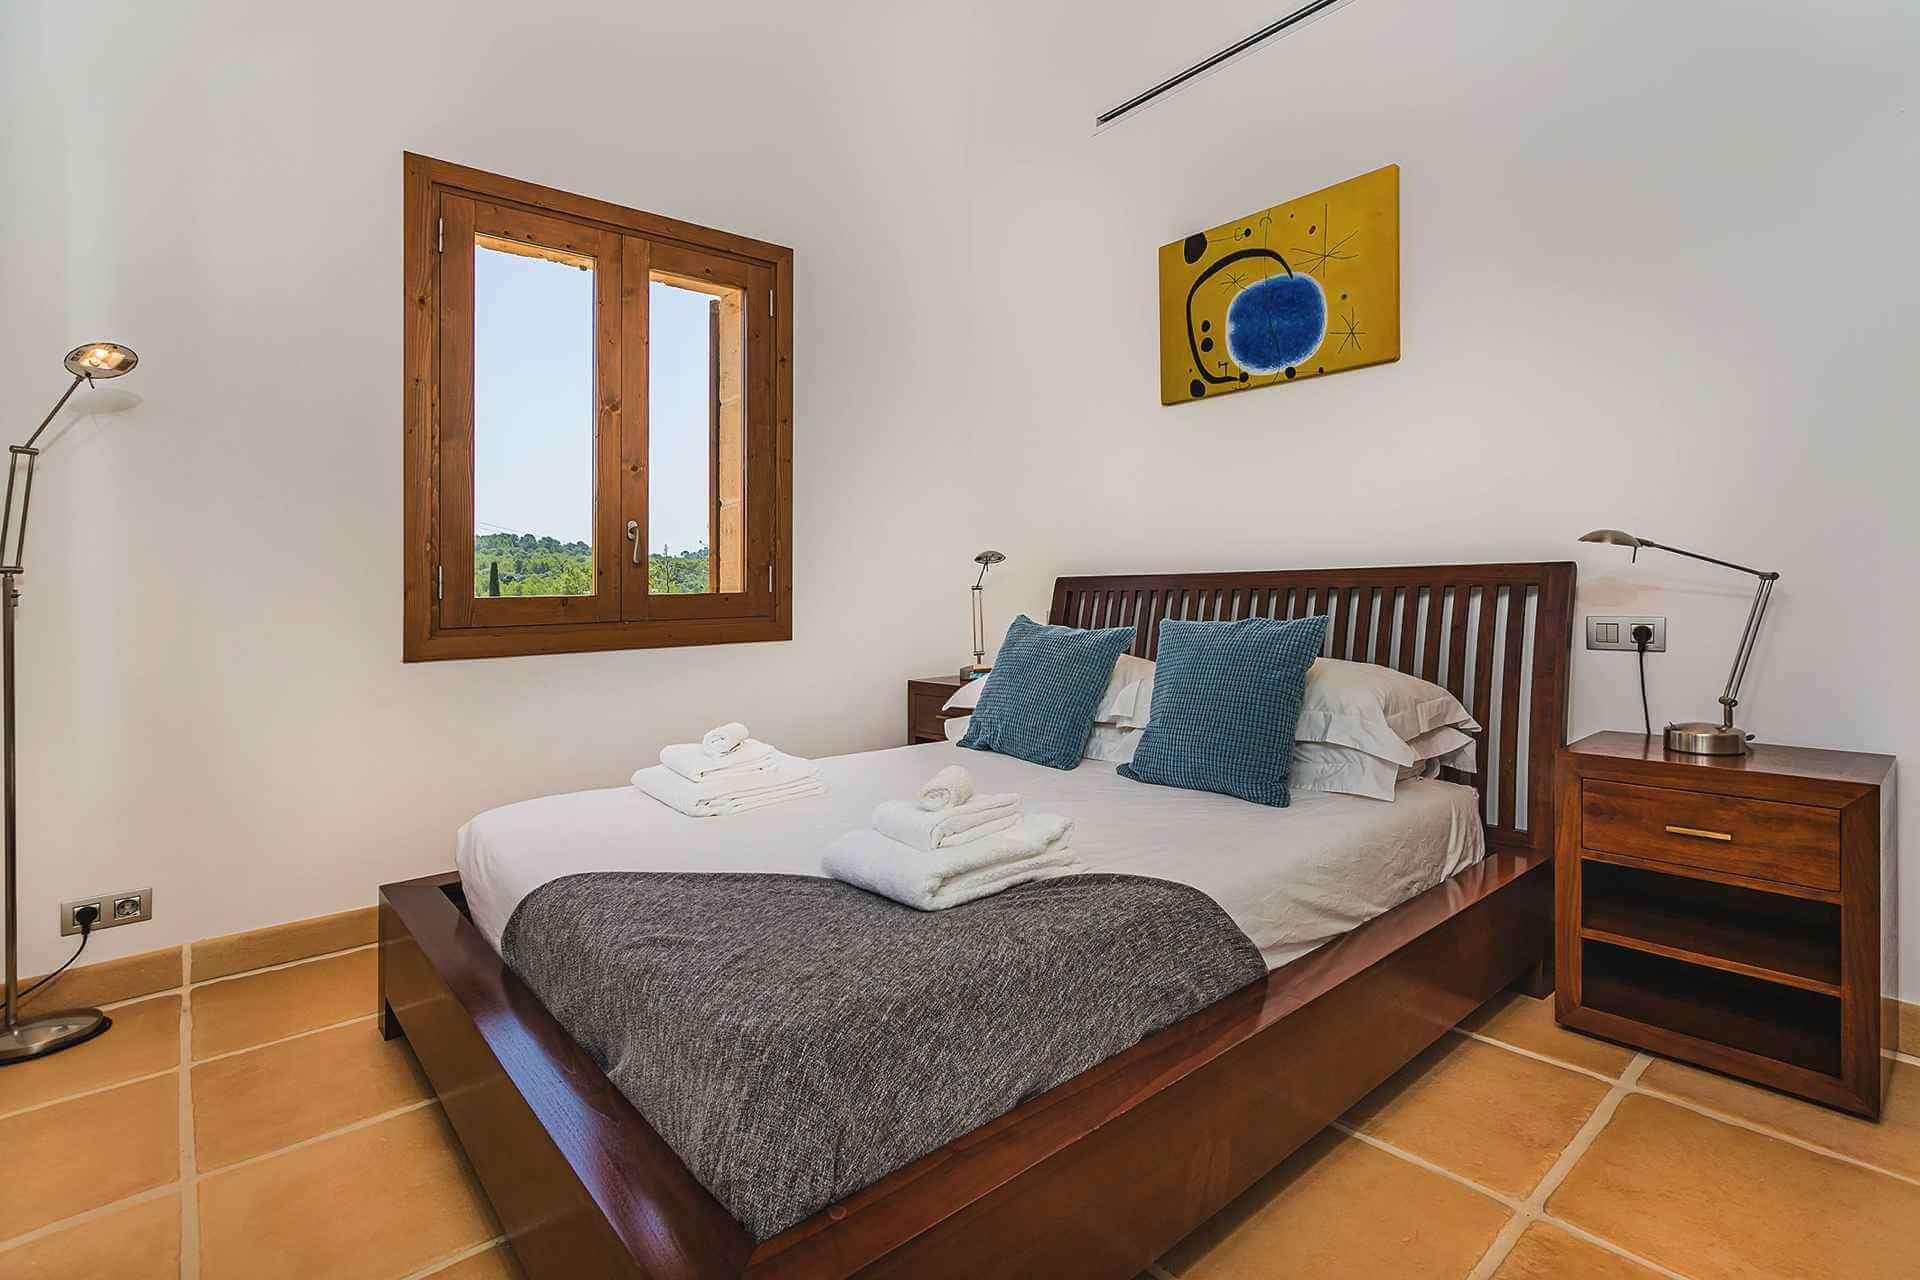 01-348 Luxury Family Finca Mallorca North Bild 21